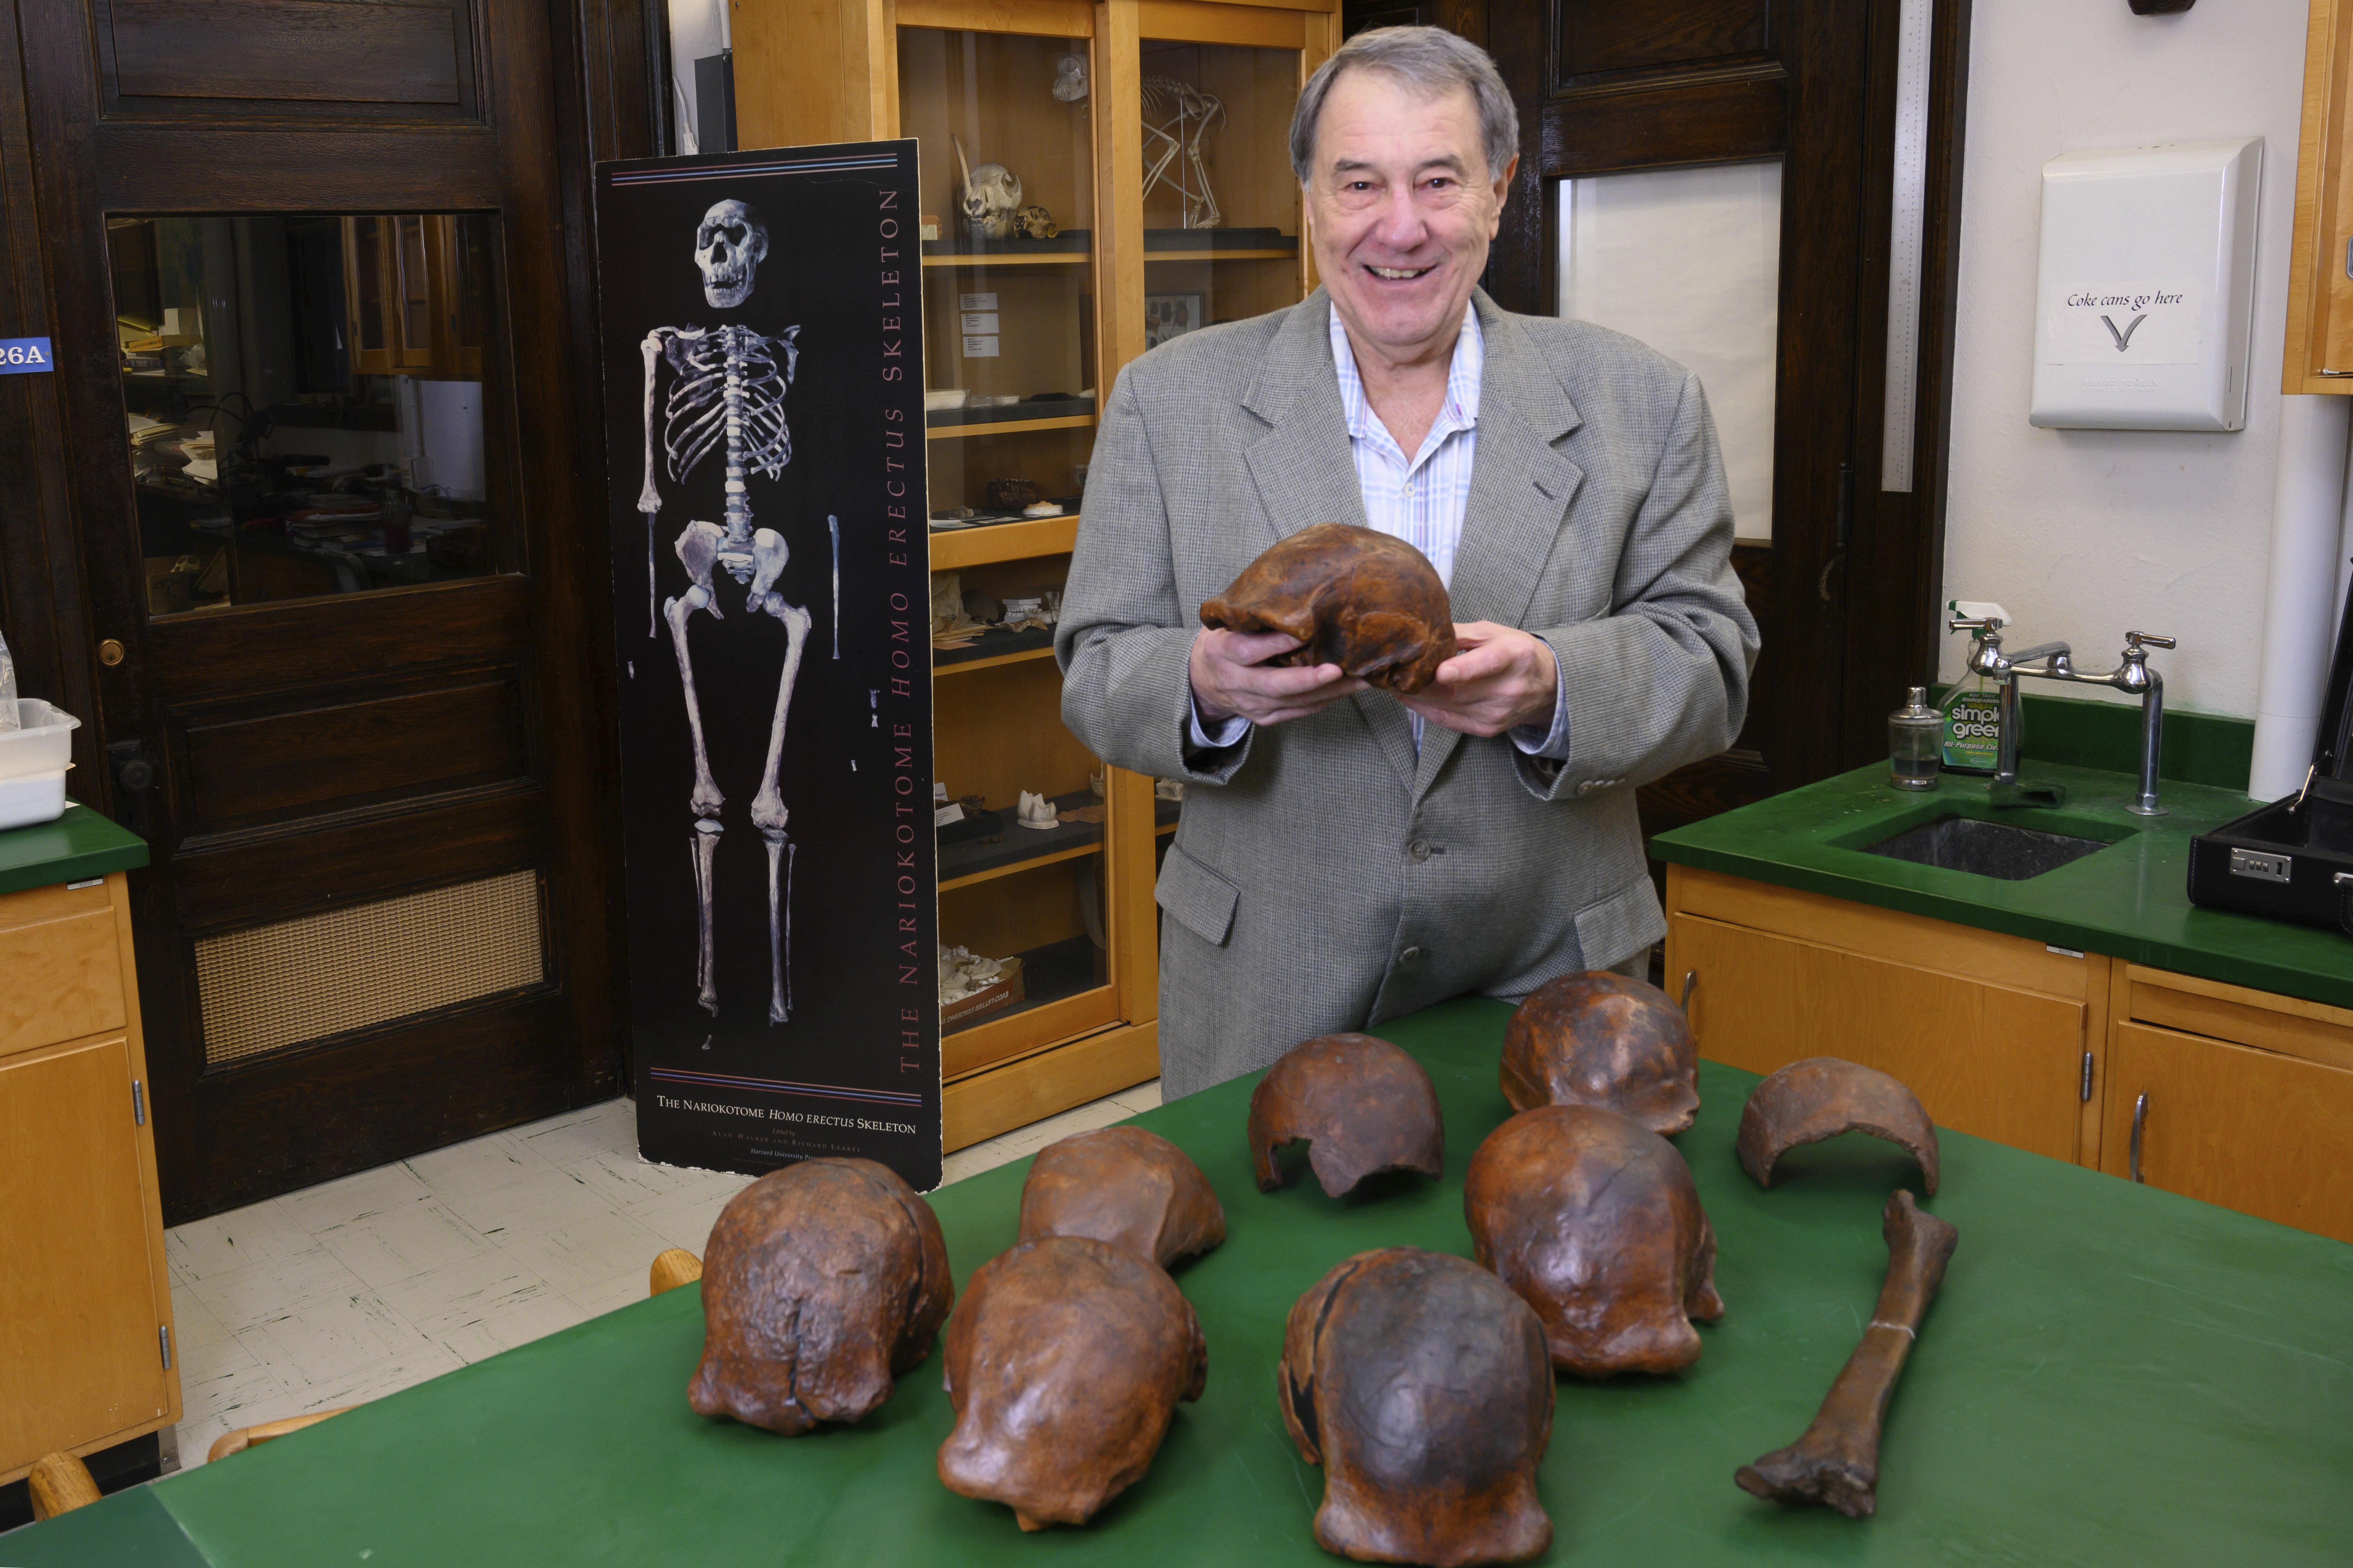 Professor Russell Ciochon holds a cast of a Homo erectus skull